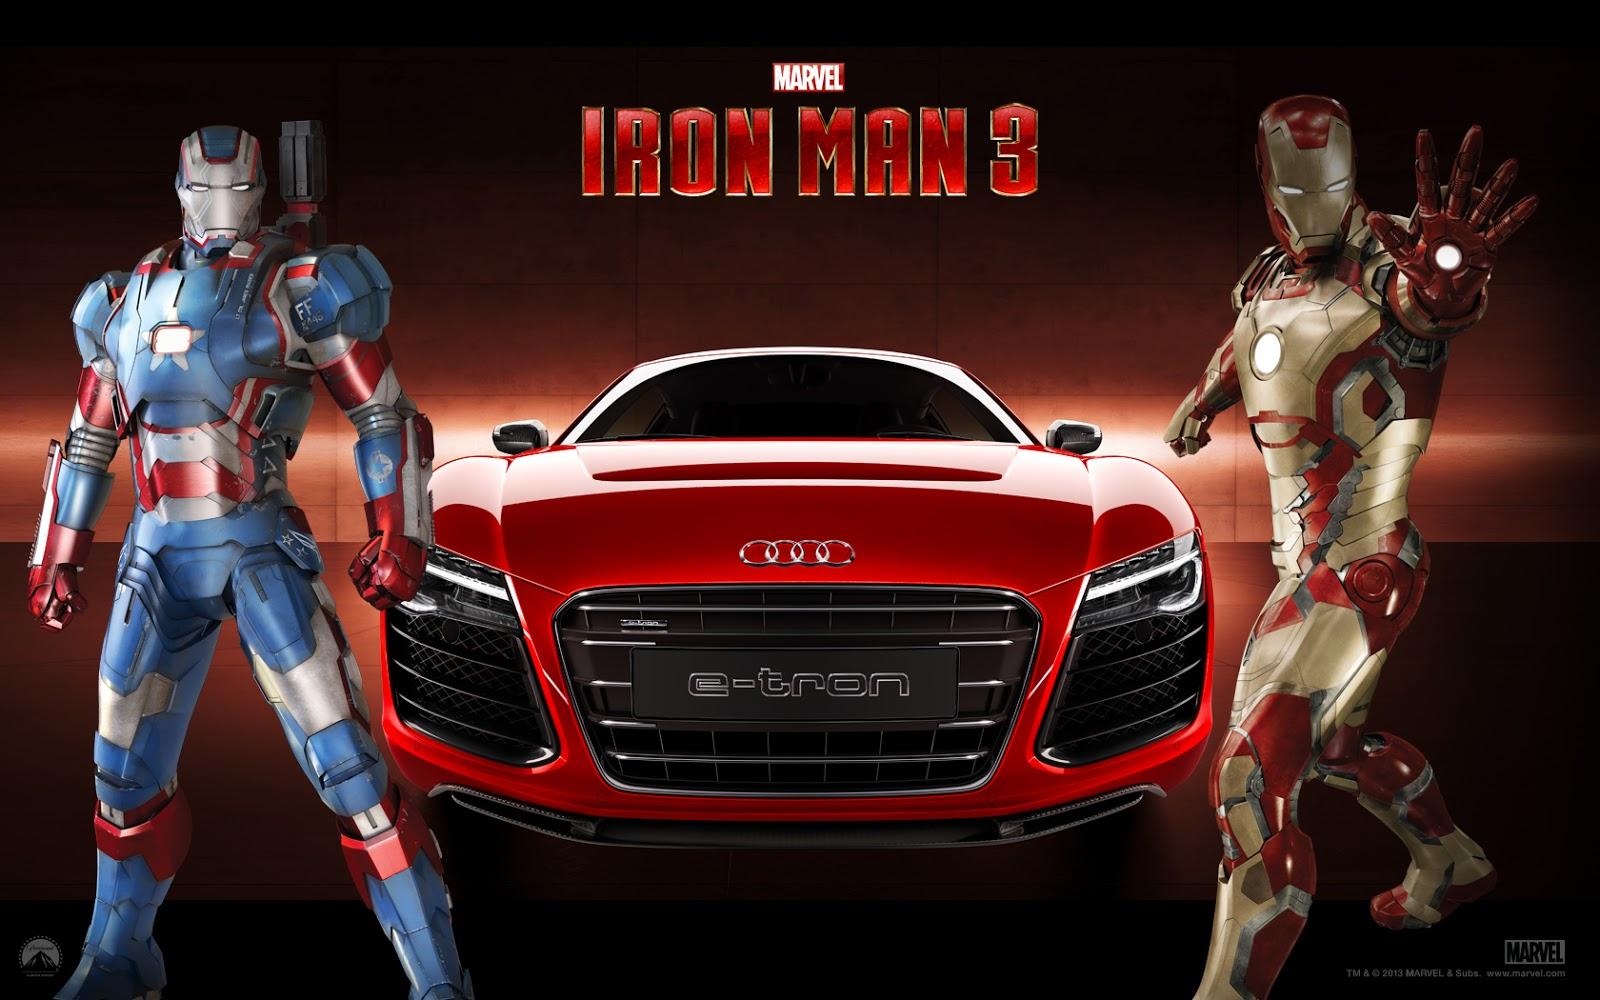 Iron Man Hd Wallpapers P Hd Wallpapers High 1600x1000